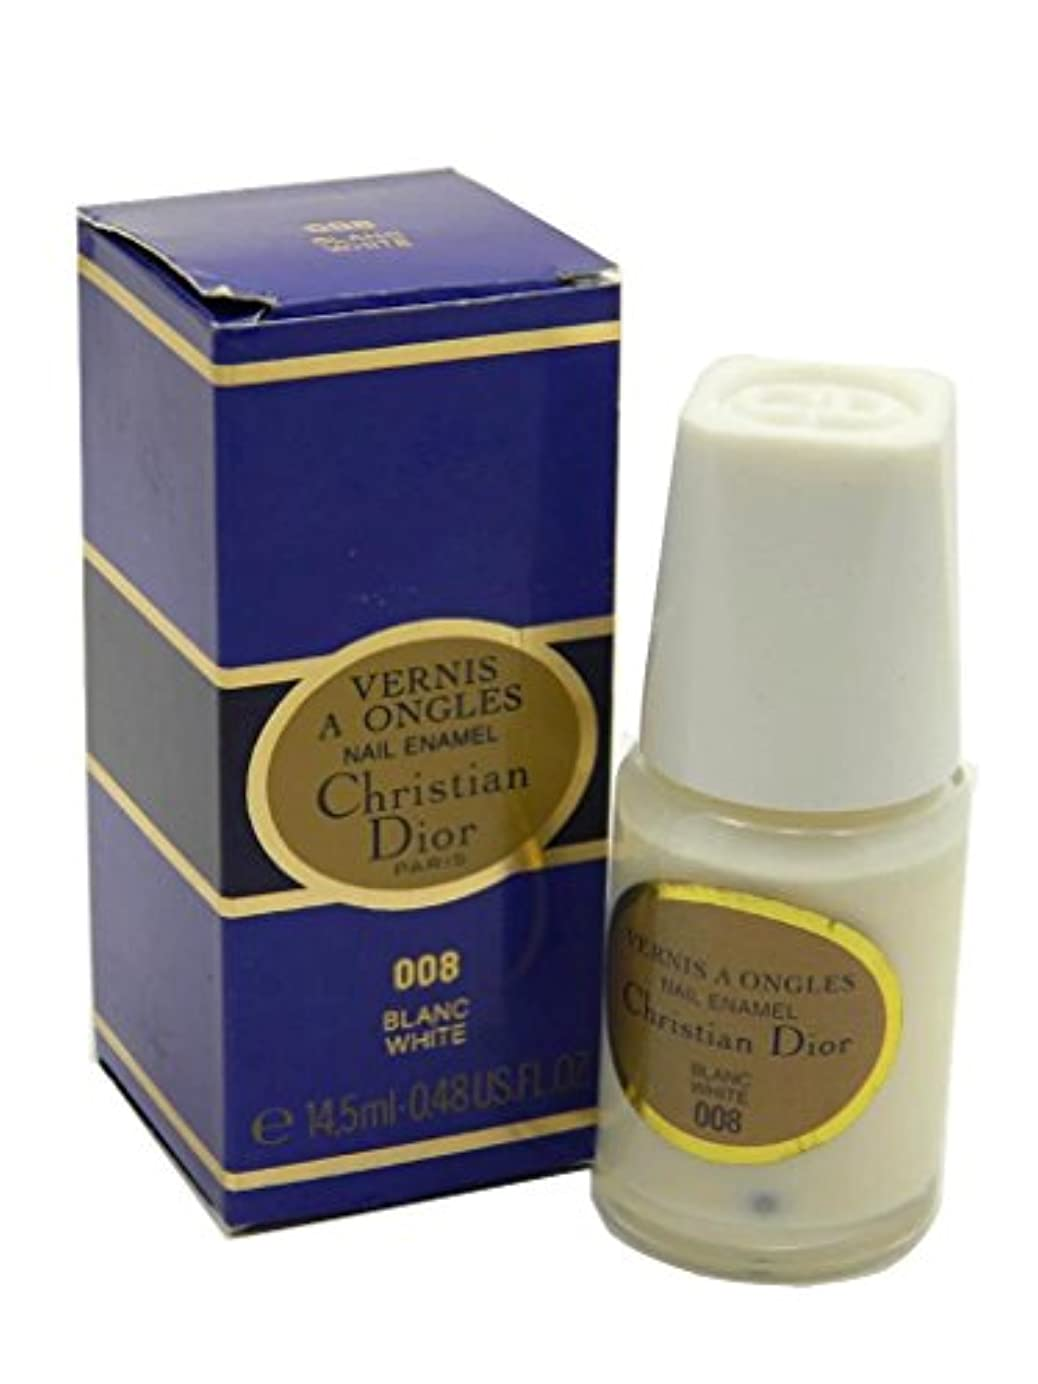 Dior Vernis A Ongles Nail Enamel Polish 008 White(ディオール ヴェルニ ア オングル ネイルエナメル ポリッシュ 008 ホワイト) [並行輸入品]